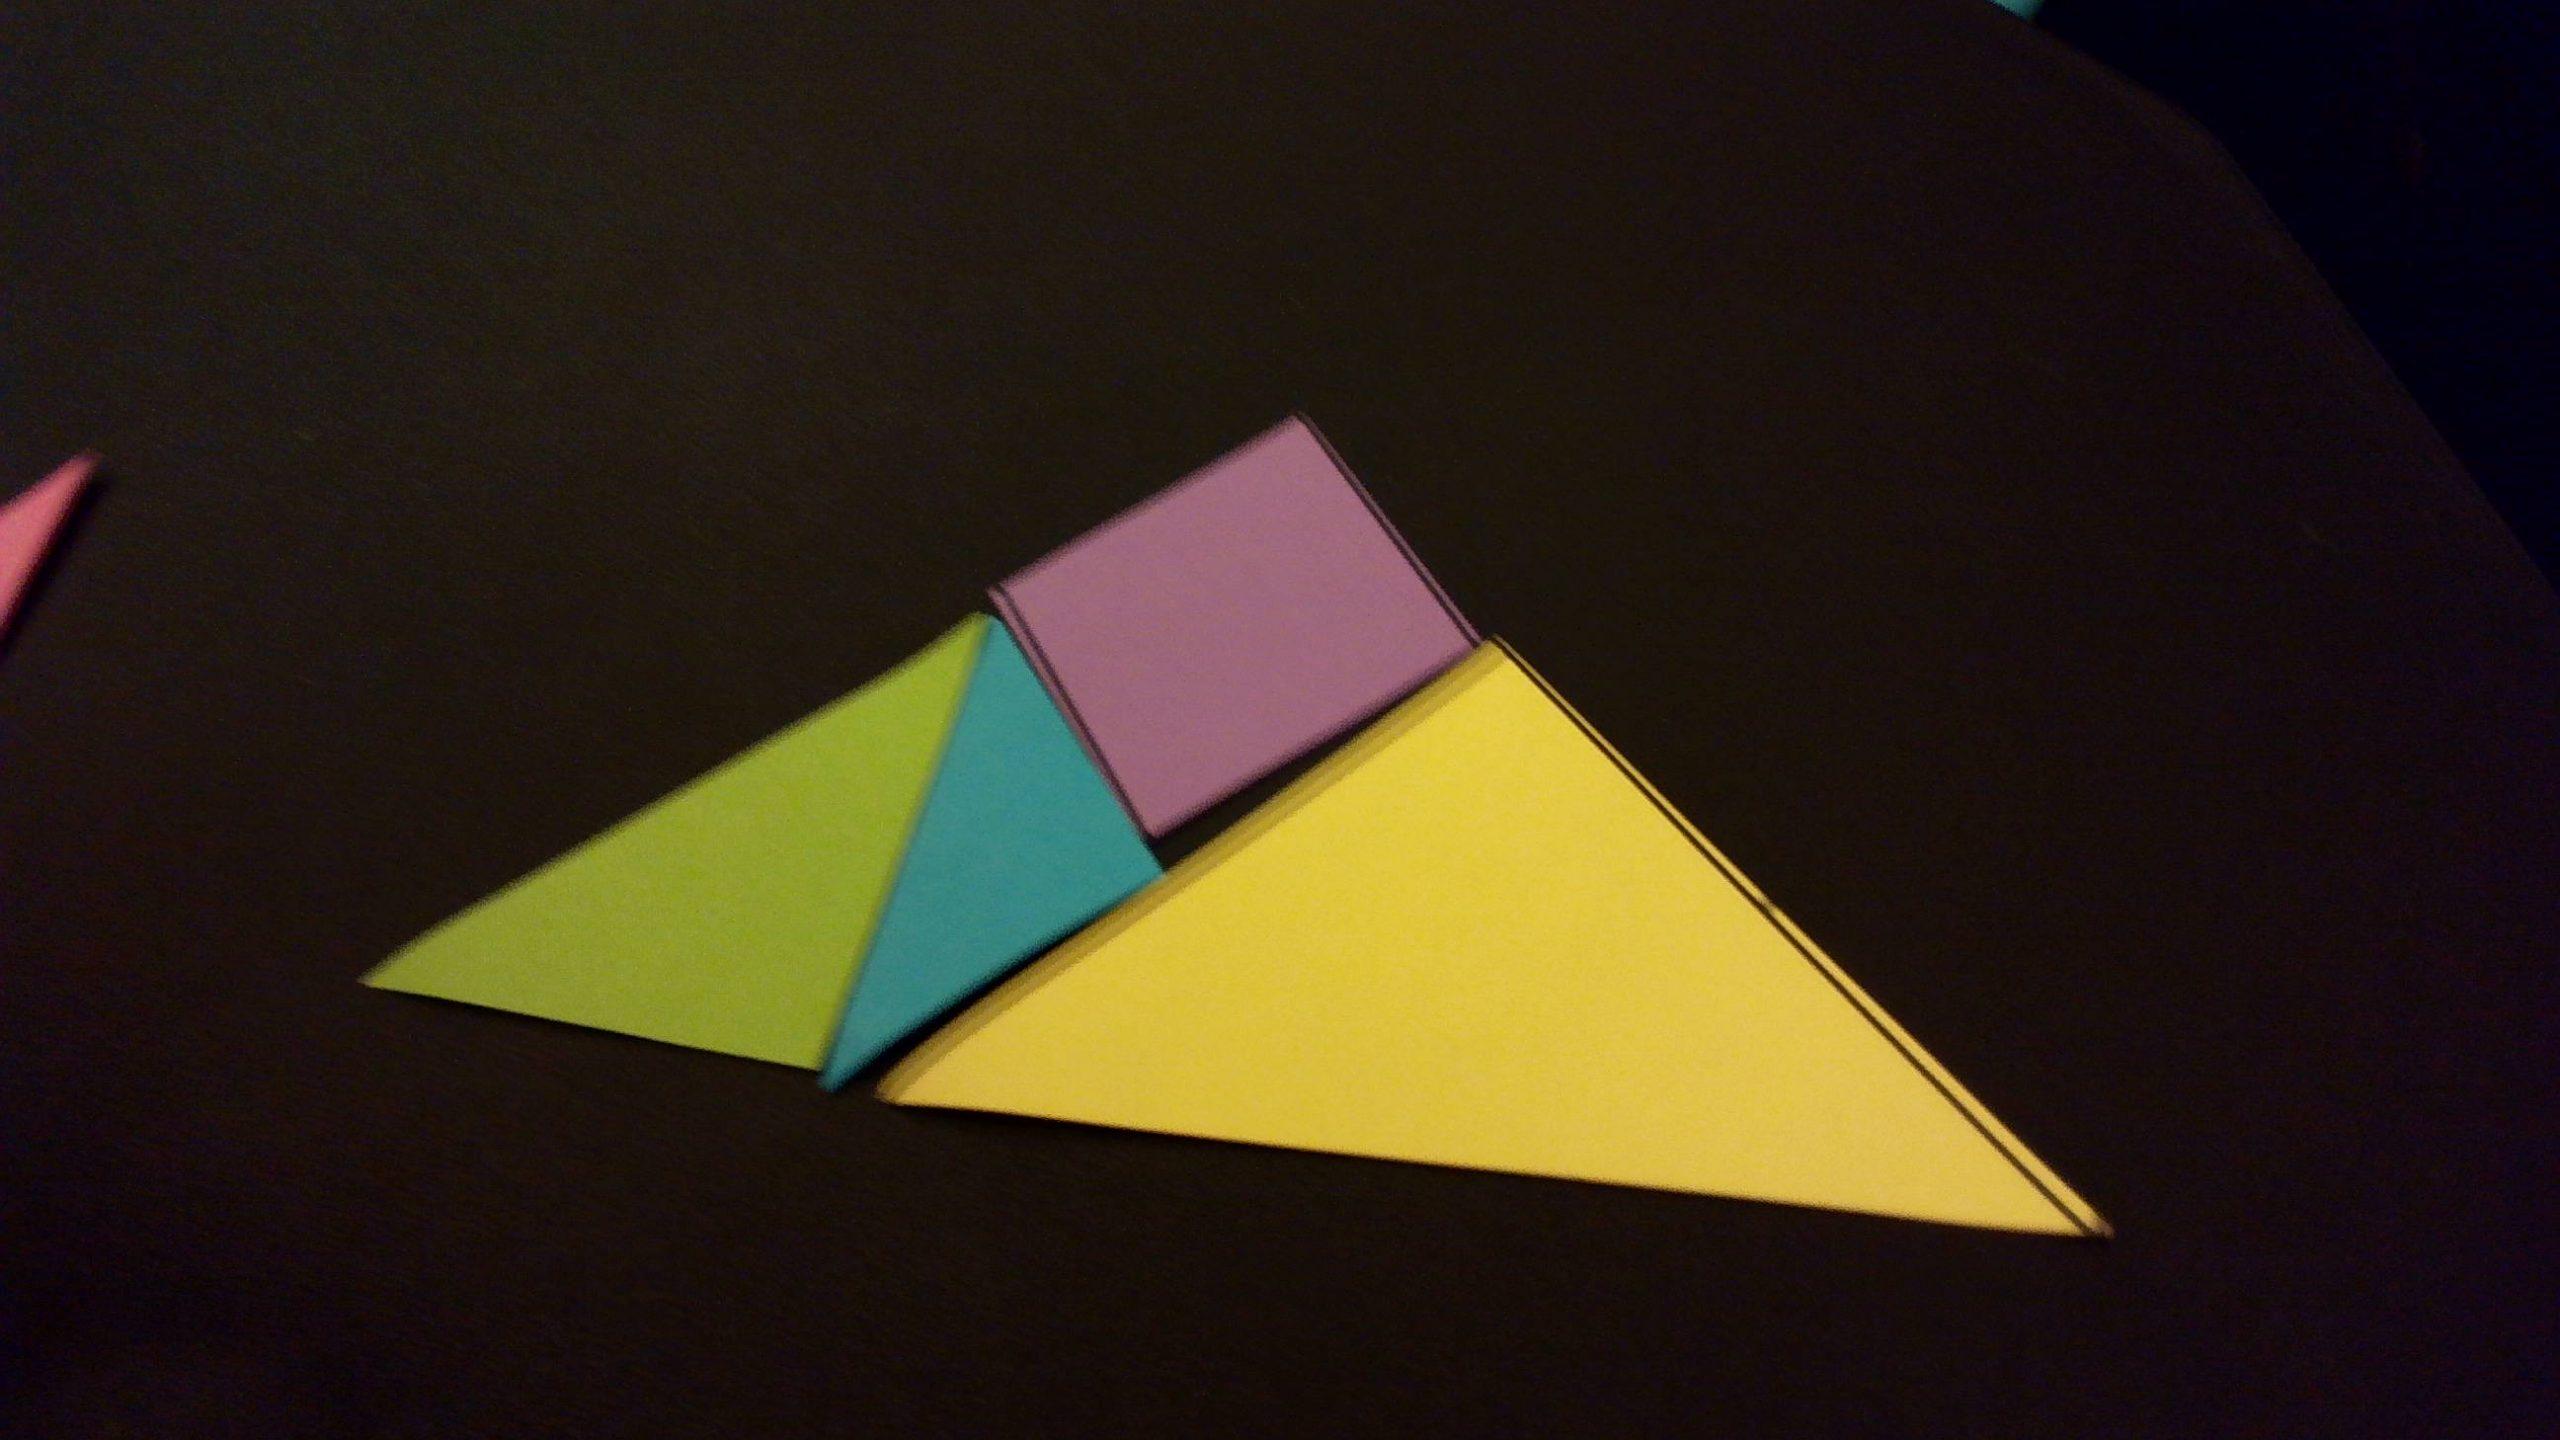 2015] Christine Yang: Tangram Triangles: Chinese, En pour Pièces Tangram